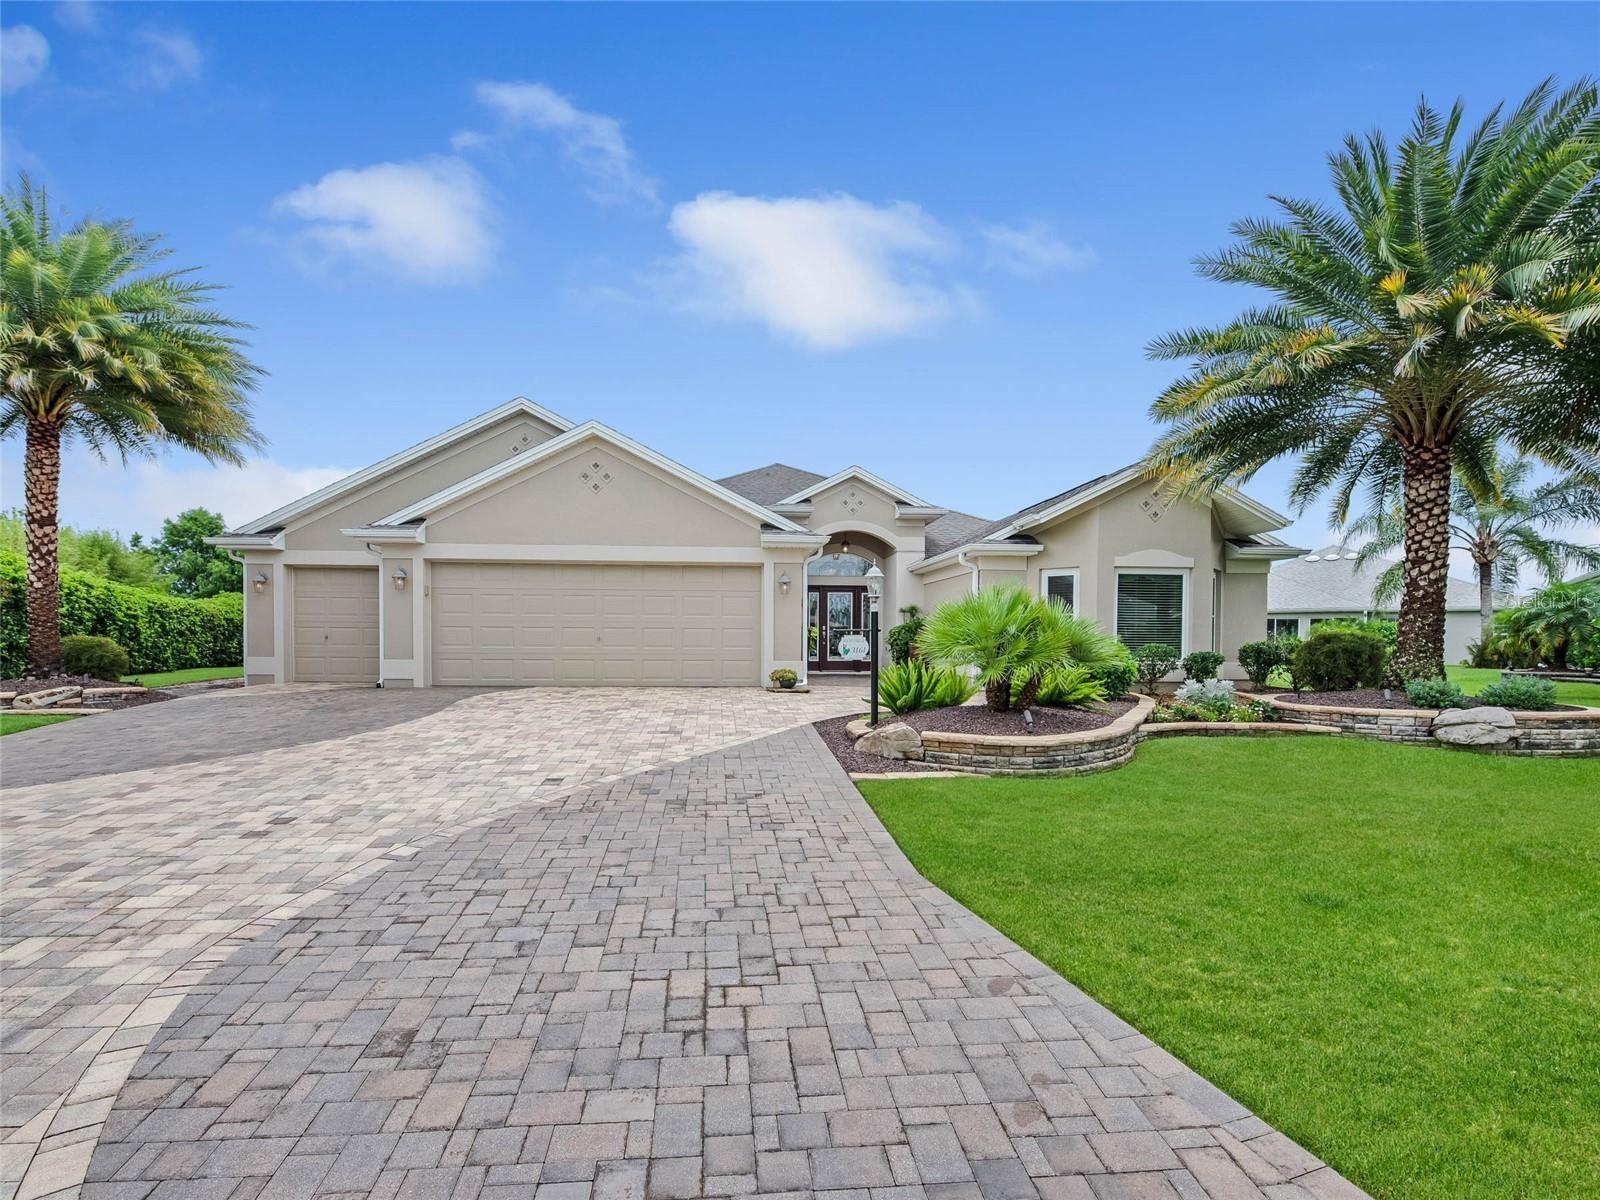 3161 KILLINGTON LOOP, The Villages, FL 32163 - #: G5044407